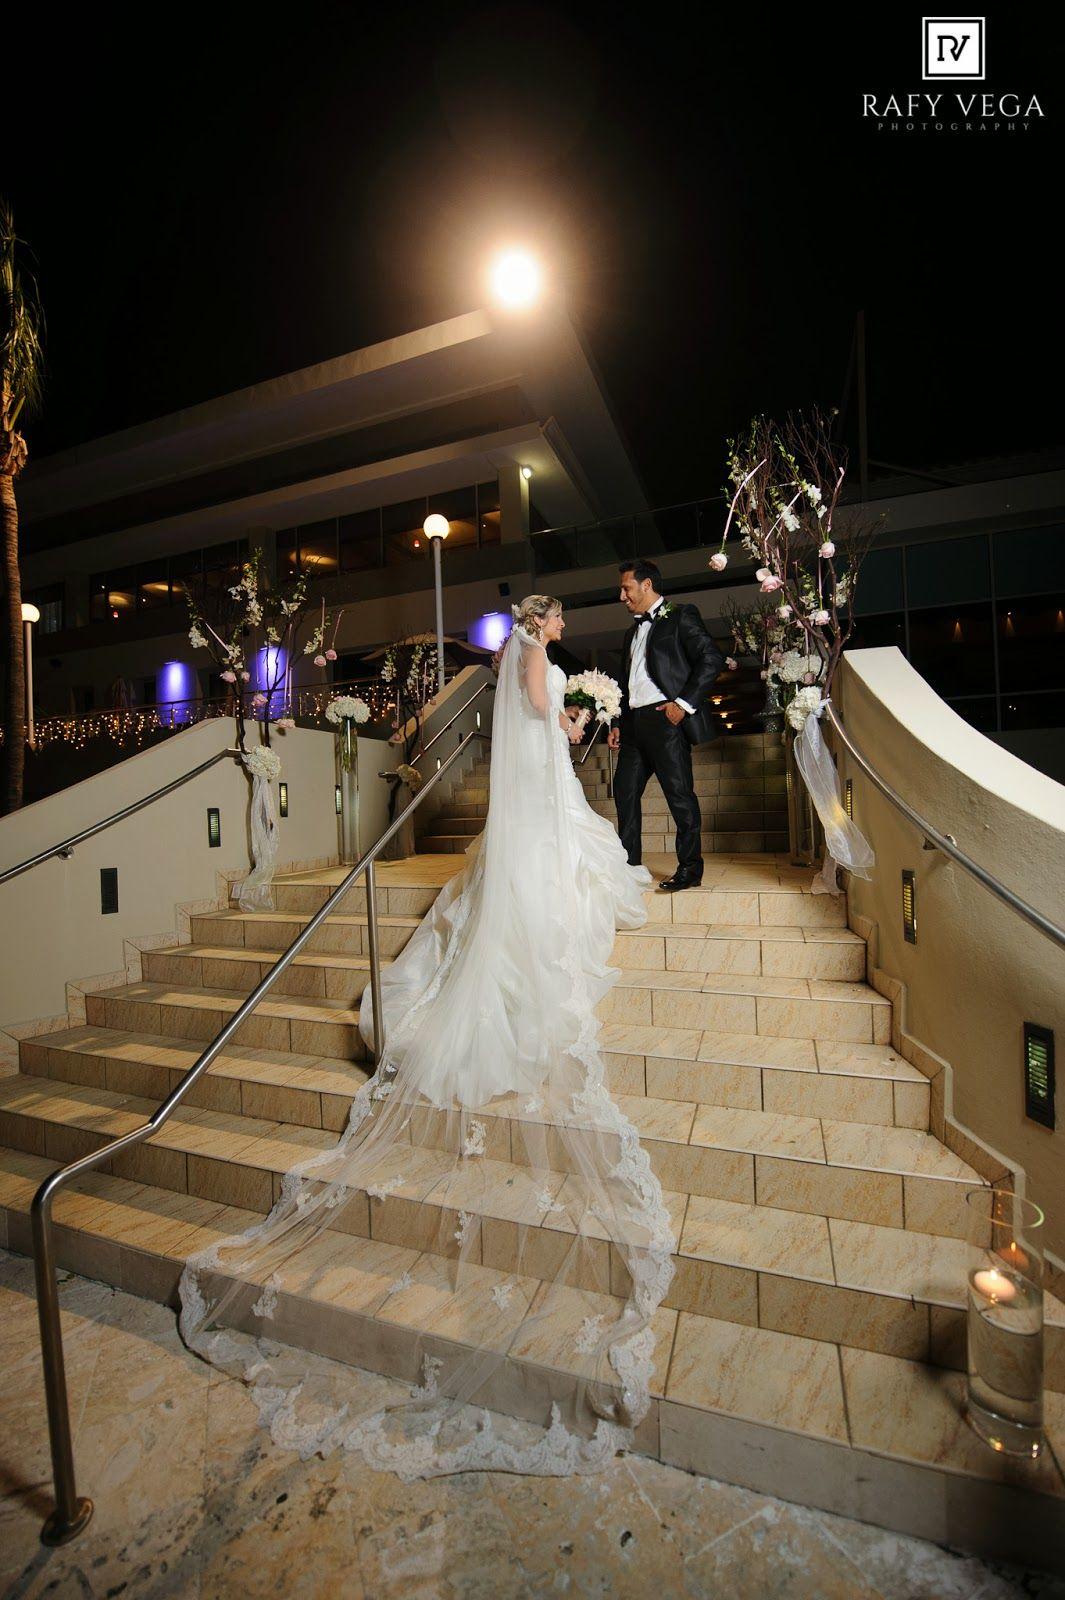 Rafy Vega Photography Fotografo De Bodas Wedding Photographer Ponce Puerto Rico Crissel Juan Orlando San Santa Maria Table Decorations Hilton Hotel